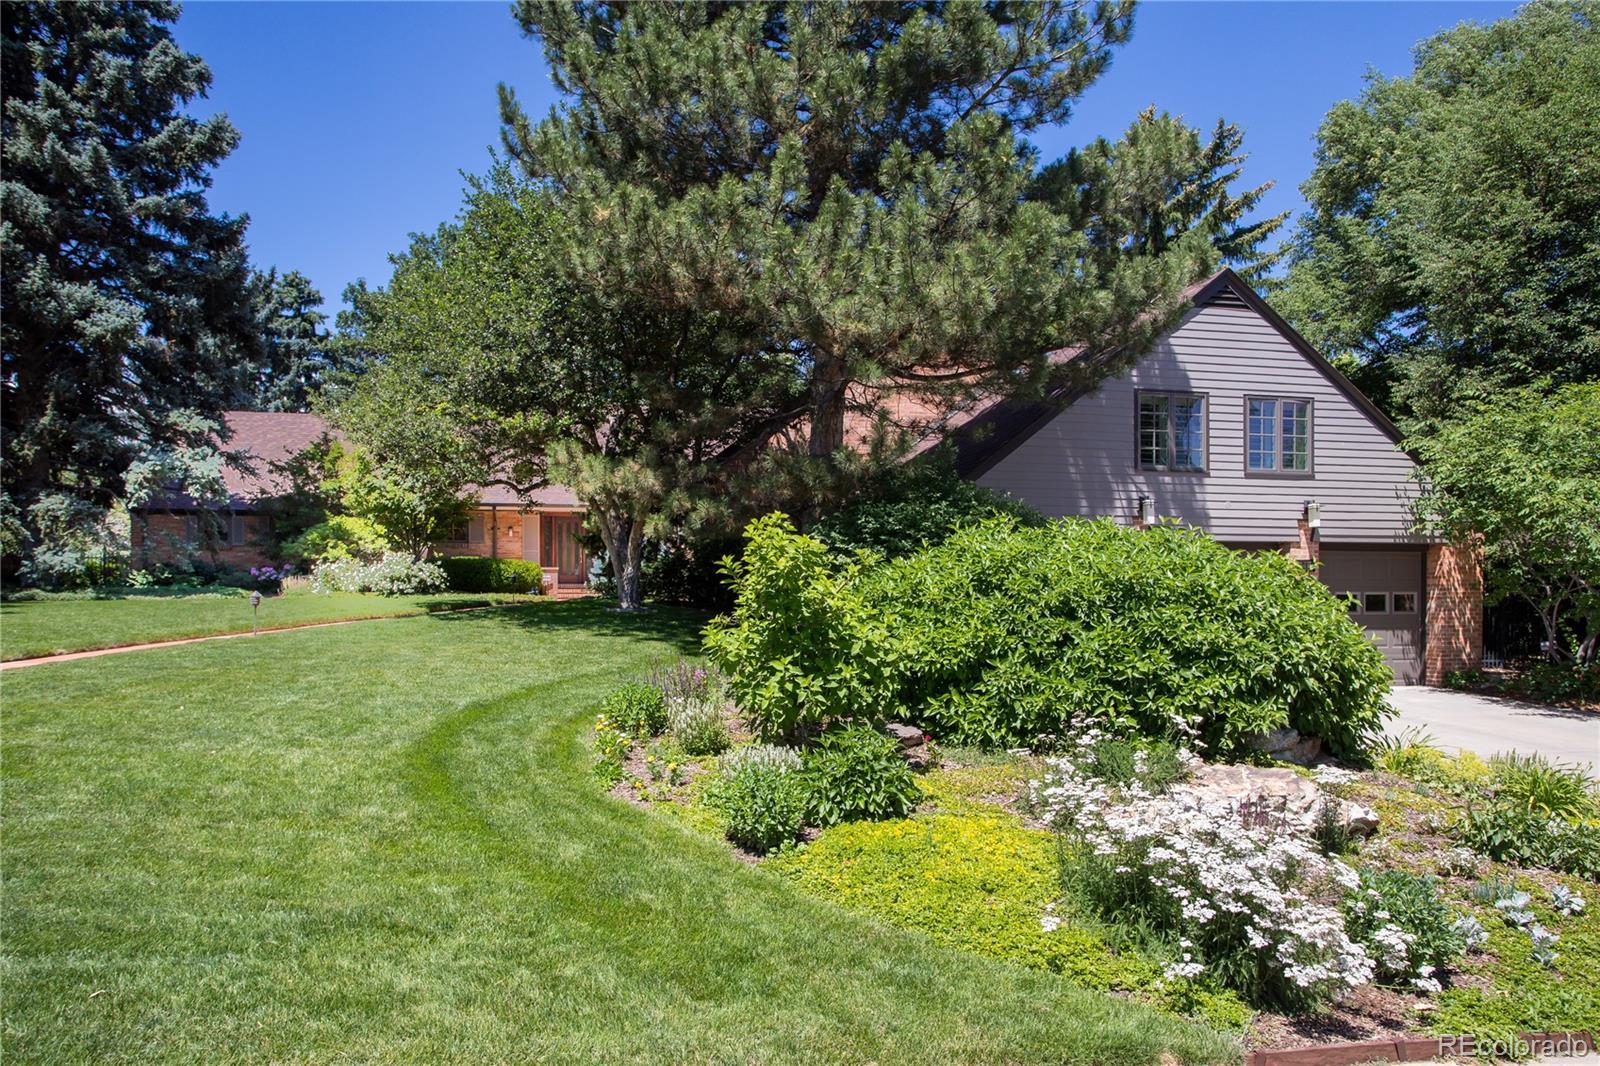 3479 E Kentucky Avenue Property Photo - Denver, CO real estate listing